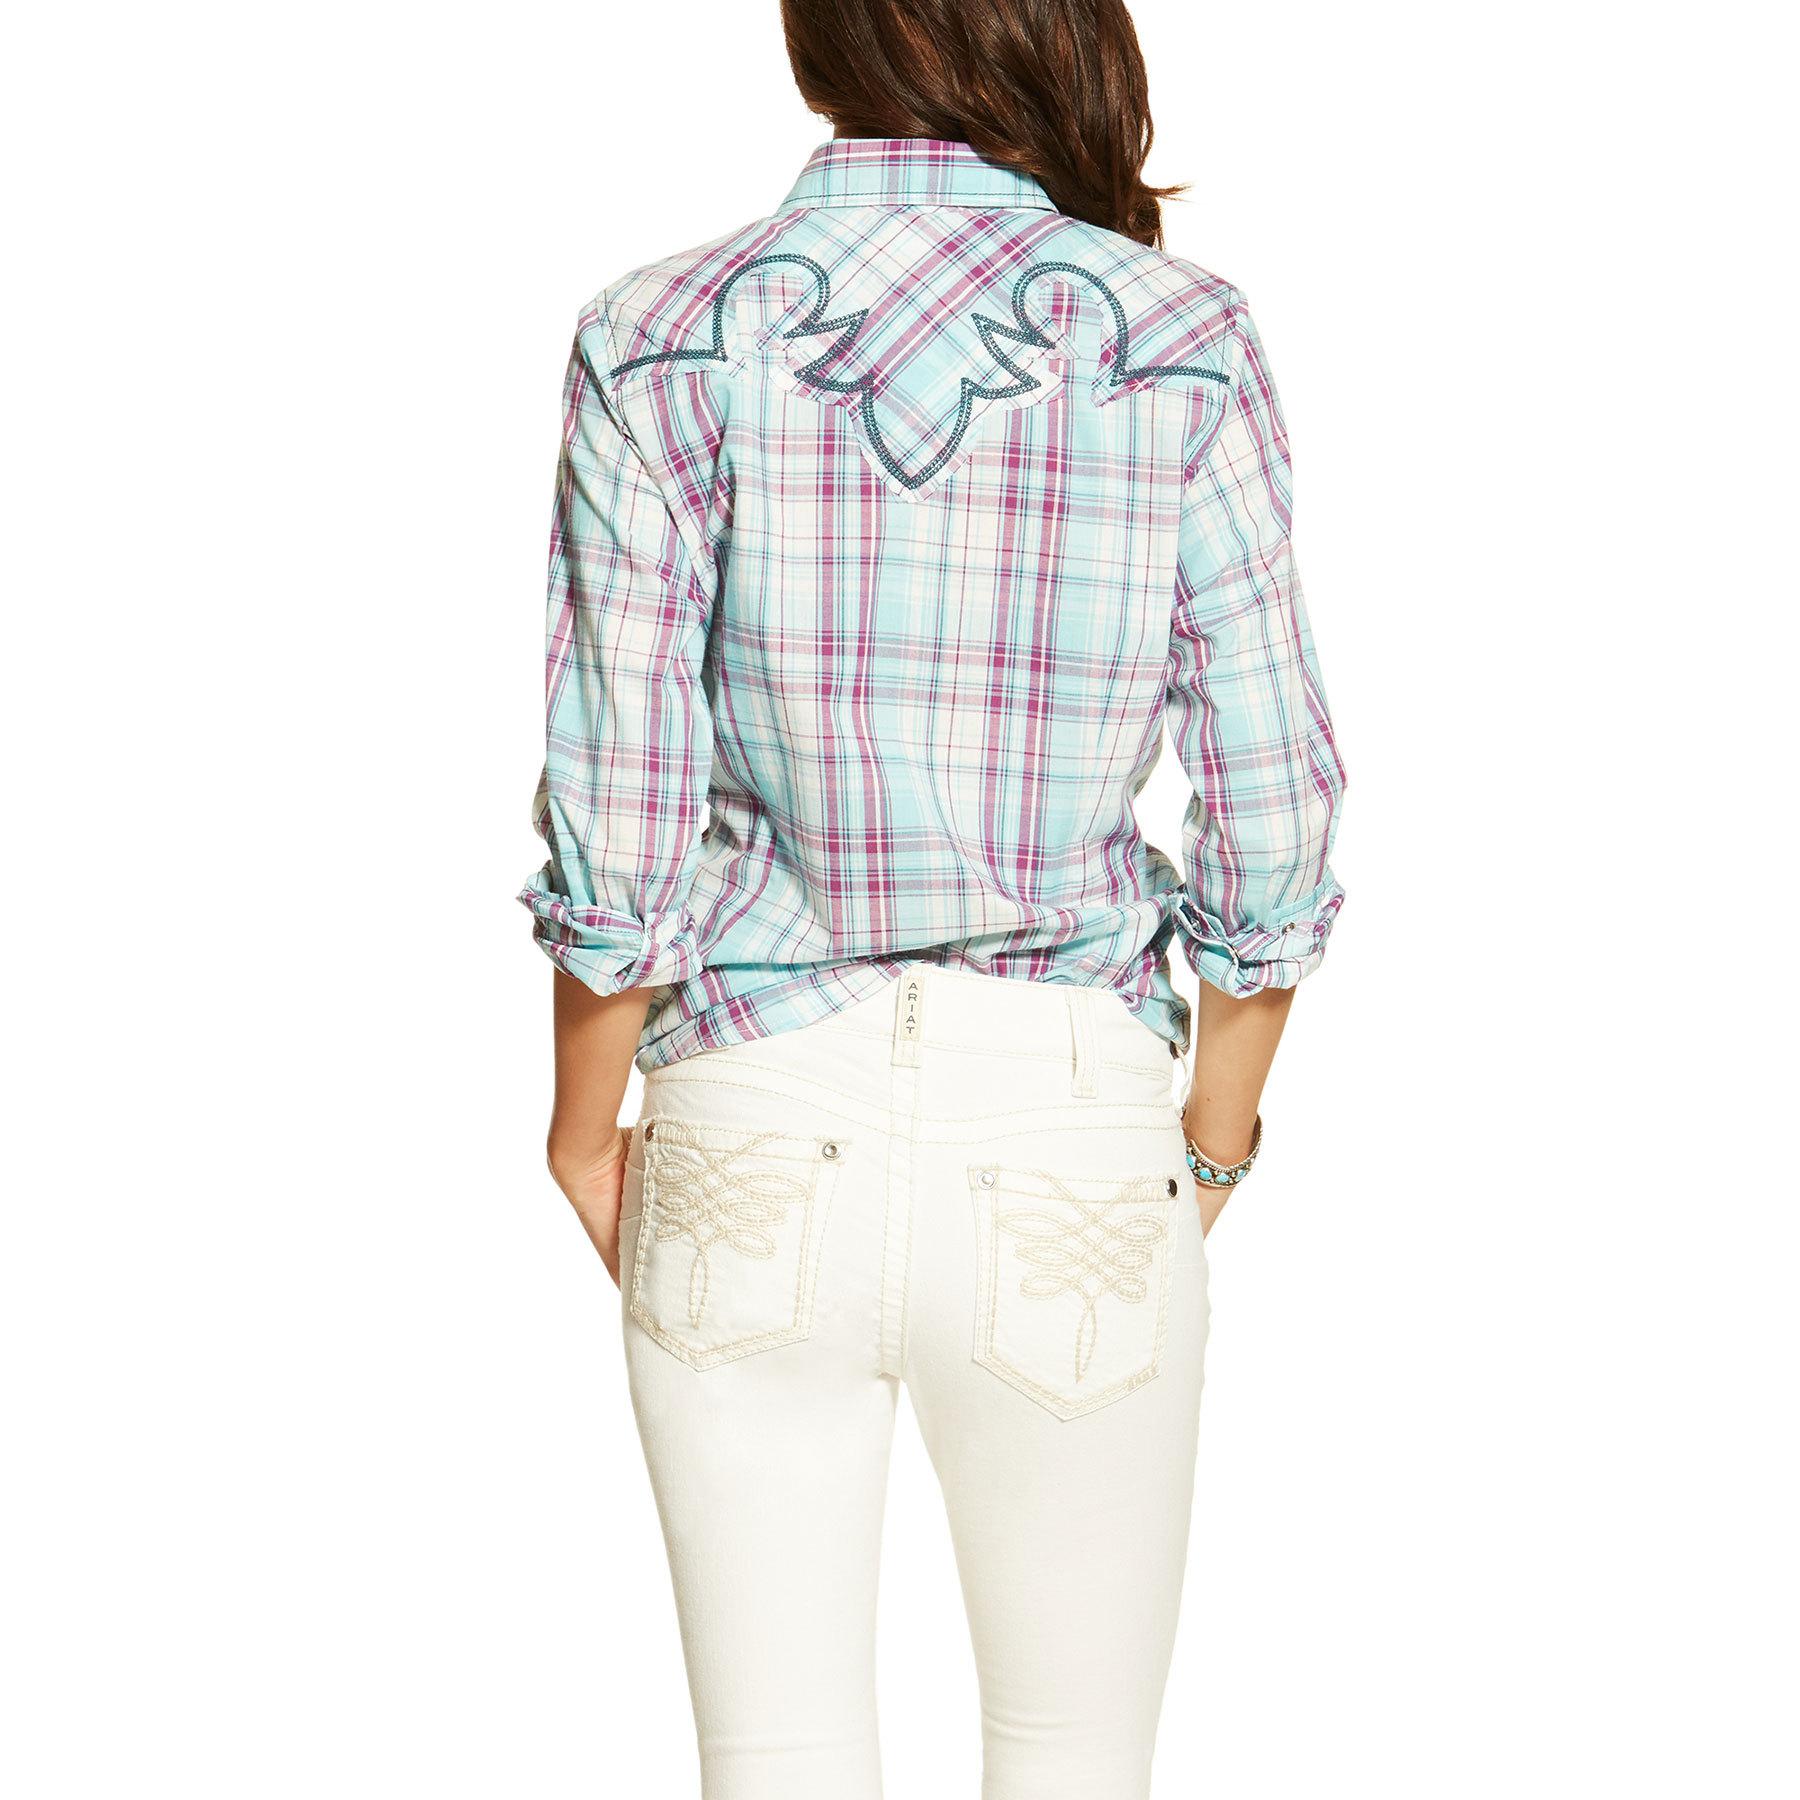 212ca69c Ariat Women's Shirt 'Loren' Snap Shirt Multi | Pakenham Western Wear And  Saddlery